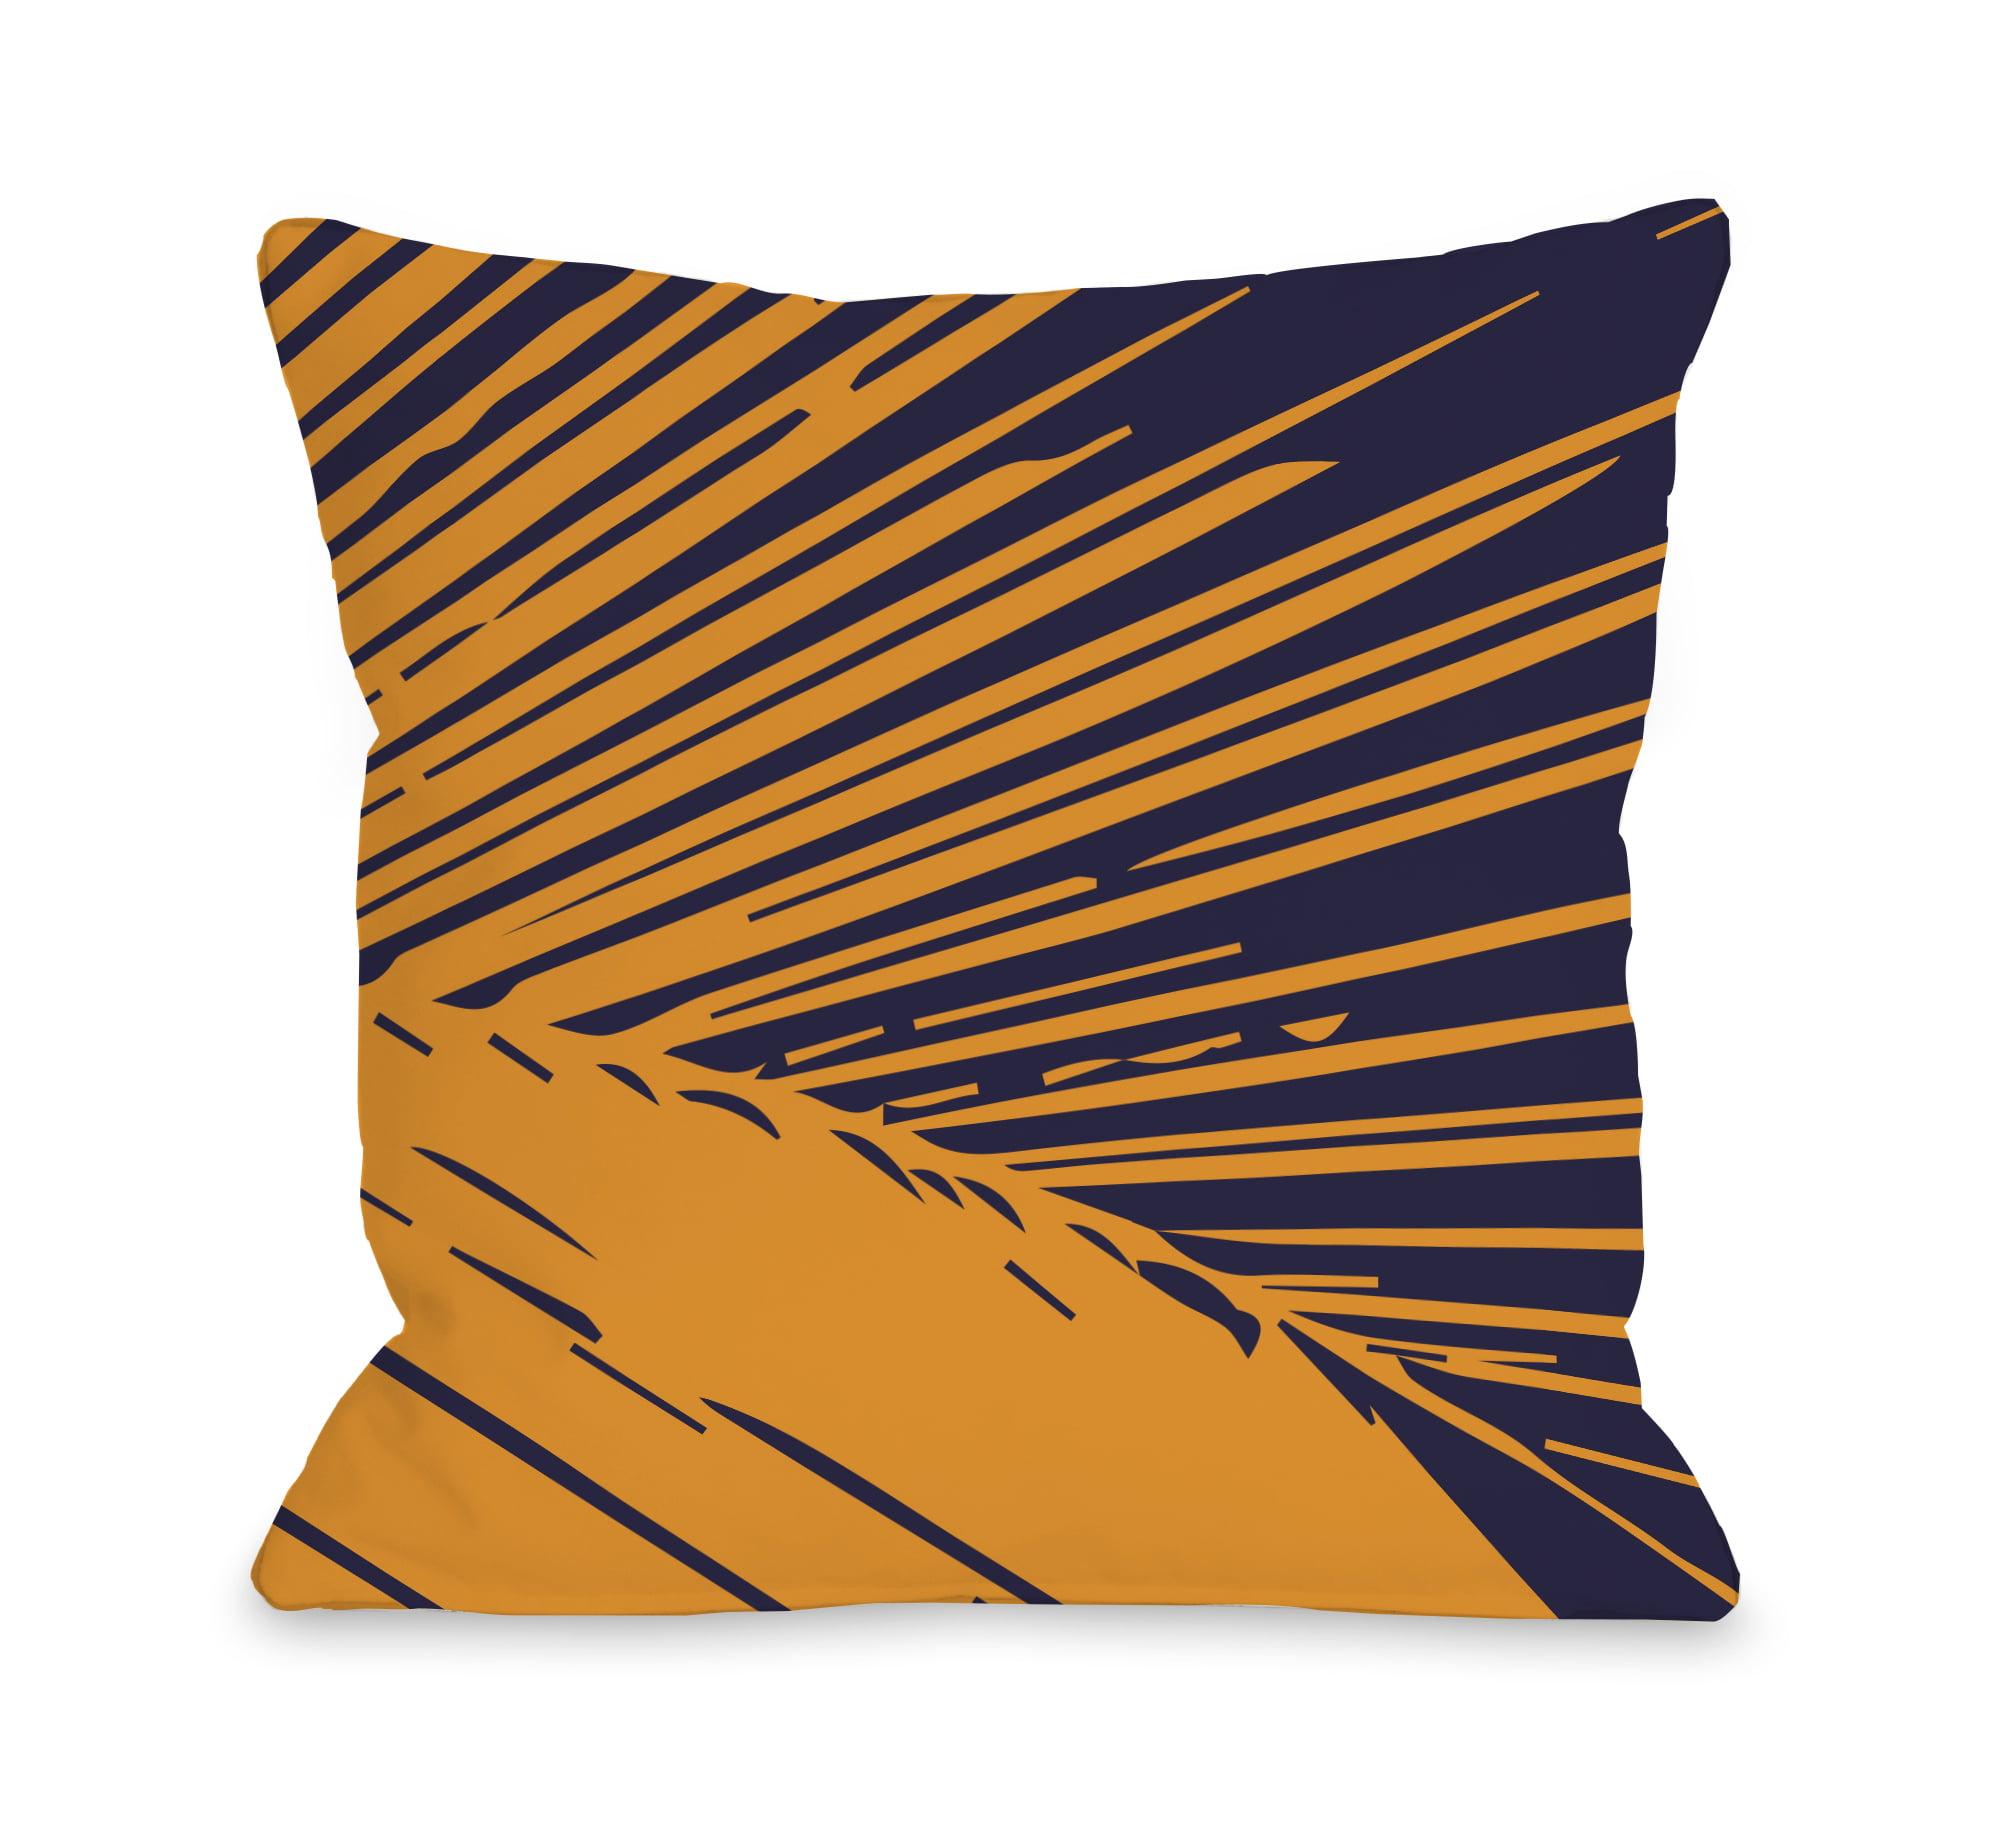 Alaiya Palm Leave - Navy Orange 18x18 Pillow by OBC